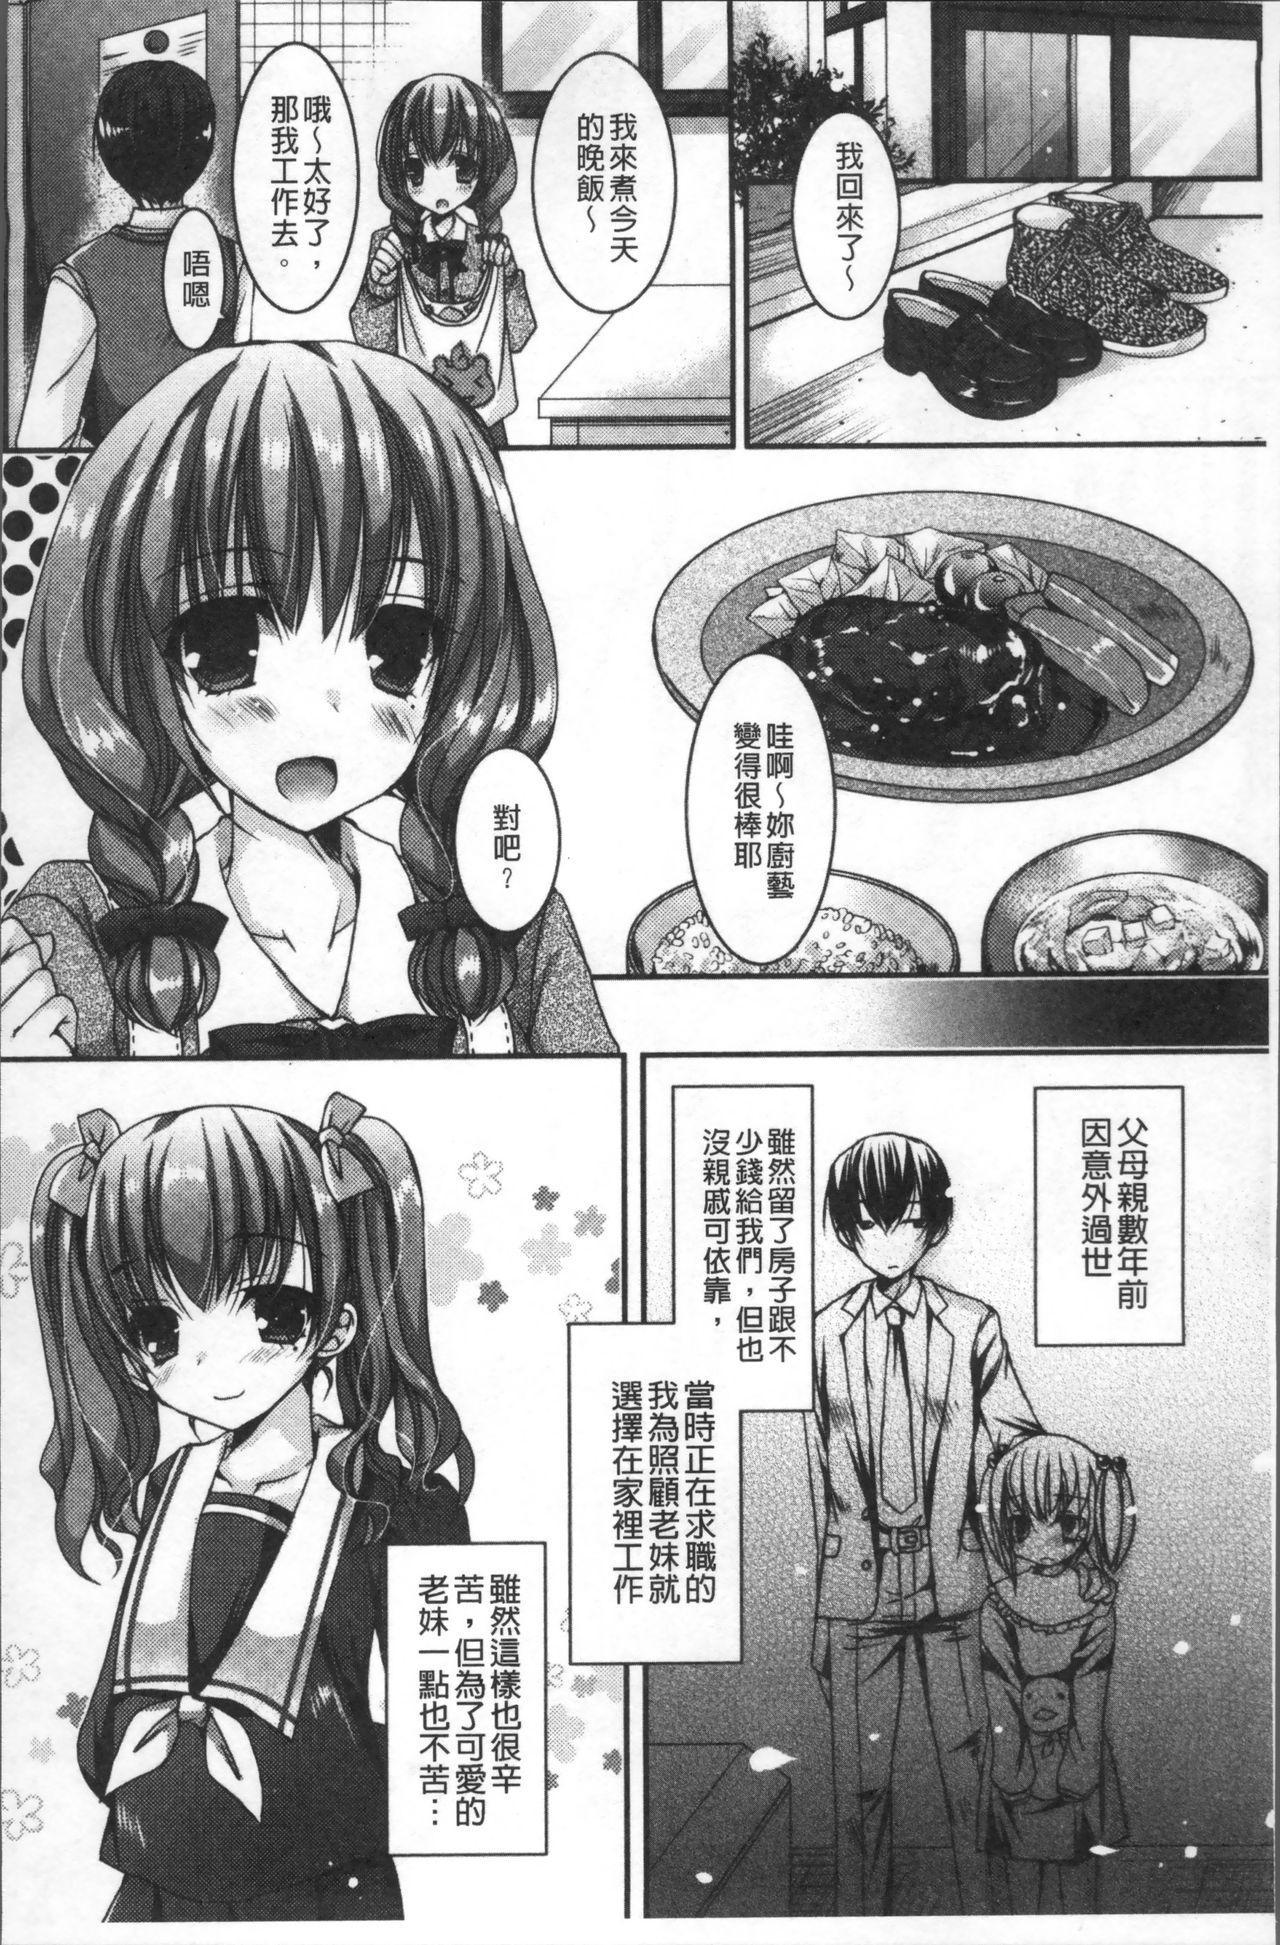 [Ueda Rieko] Doutei Killer na Imouto ~Bitch-kei Kyonyuu Gal ni Yarare Houdai~ | 童貞殺手的妹妹~被淫女系巨乳小辣妹給玩弄個過癮~ [Chinese] 139